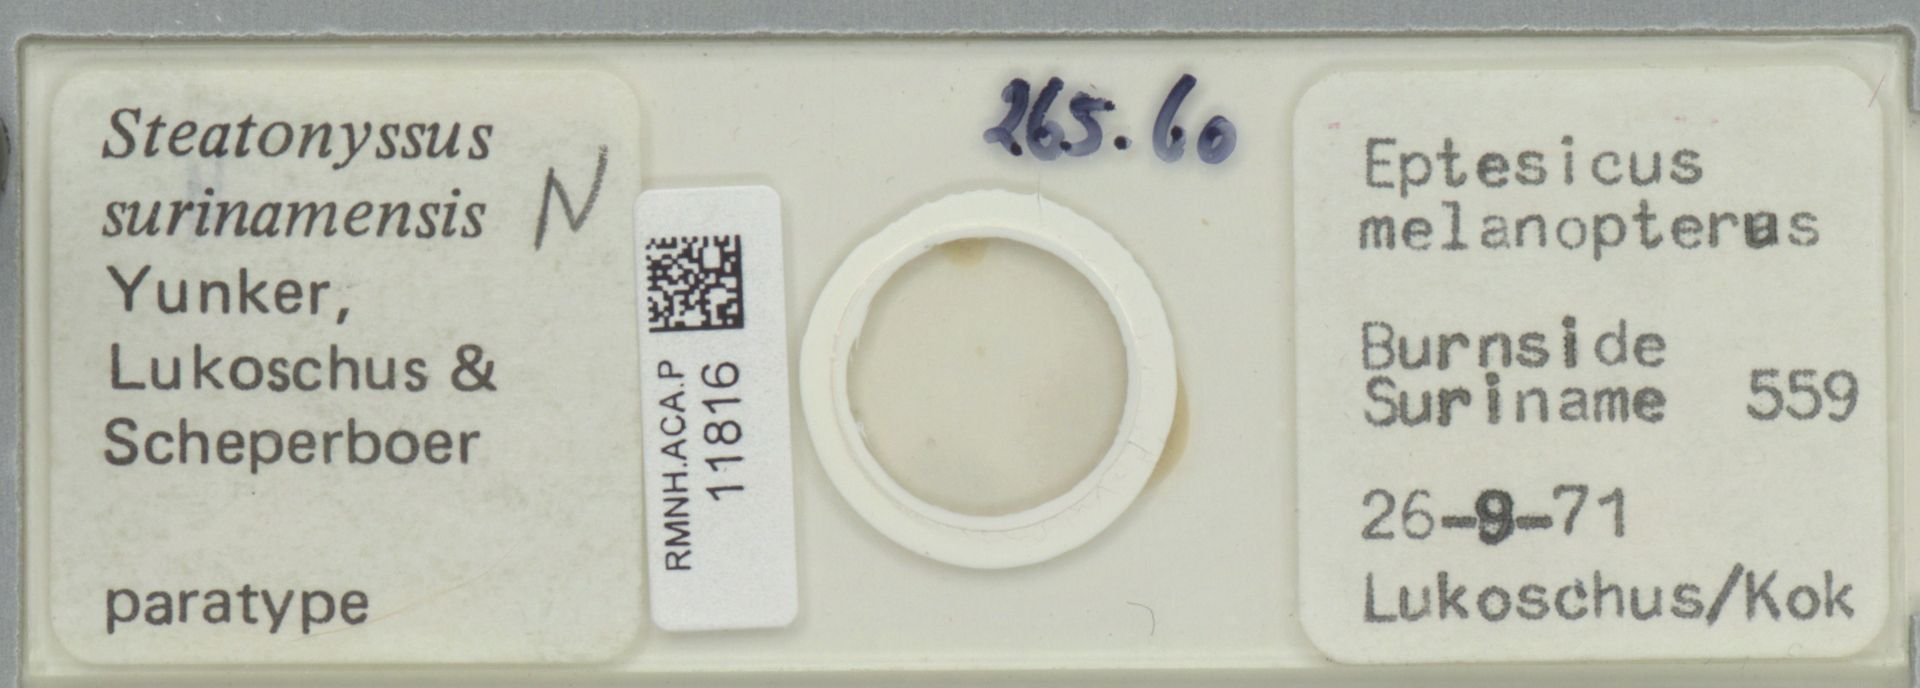 RMNH.ACA.P.11816 | Steatonyssus surinamensis